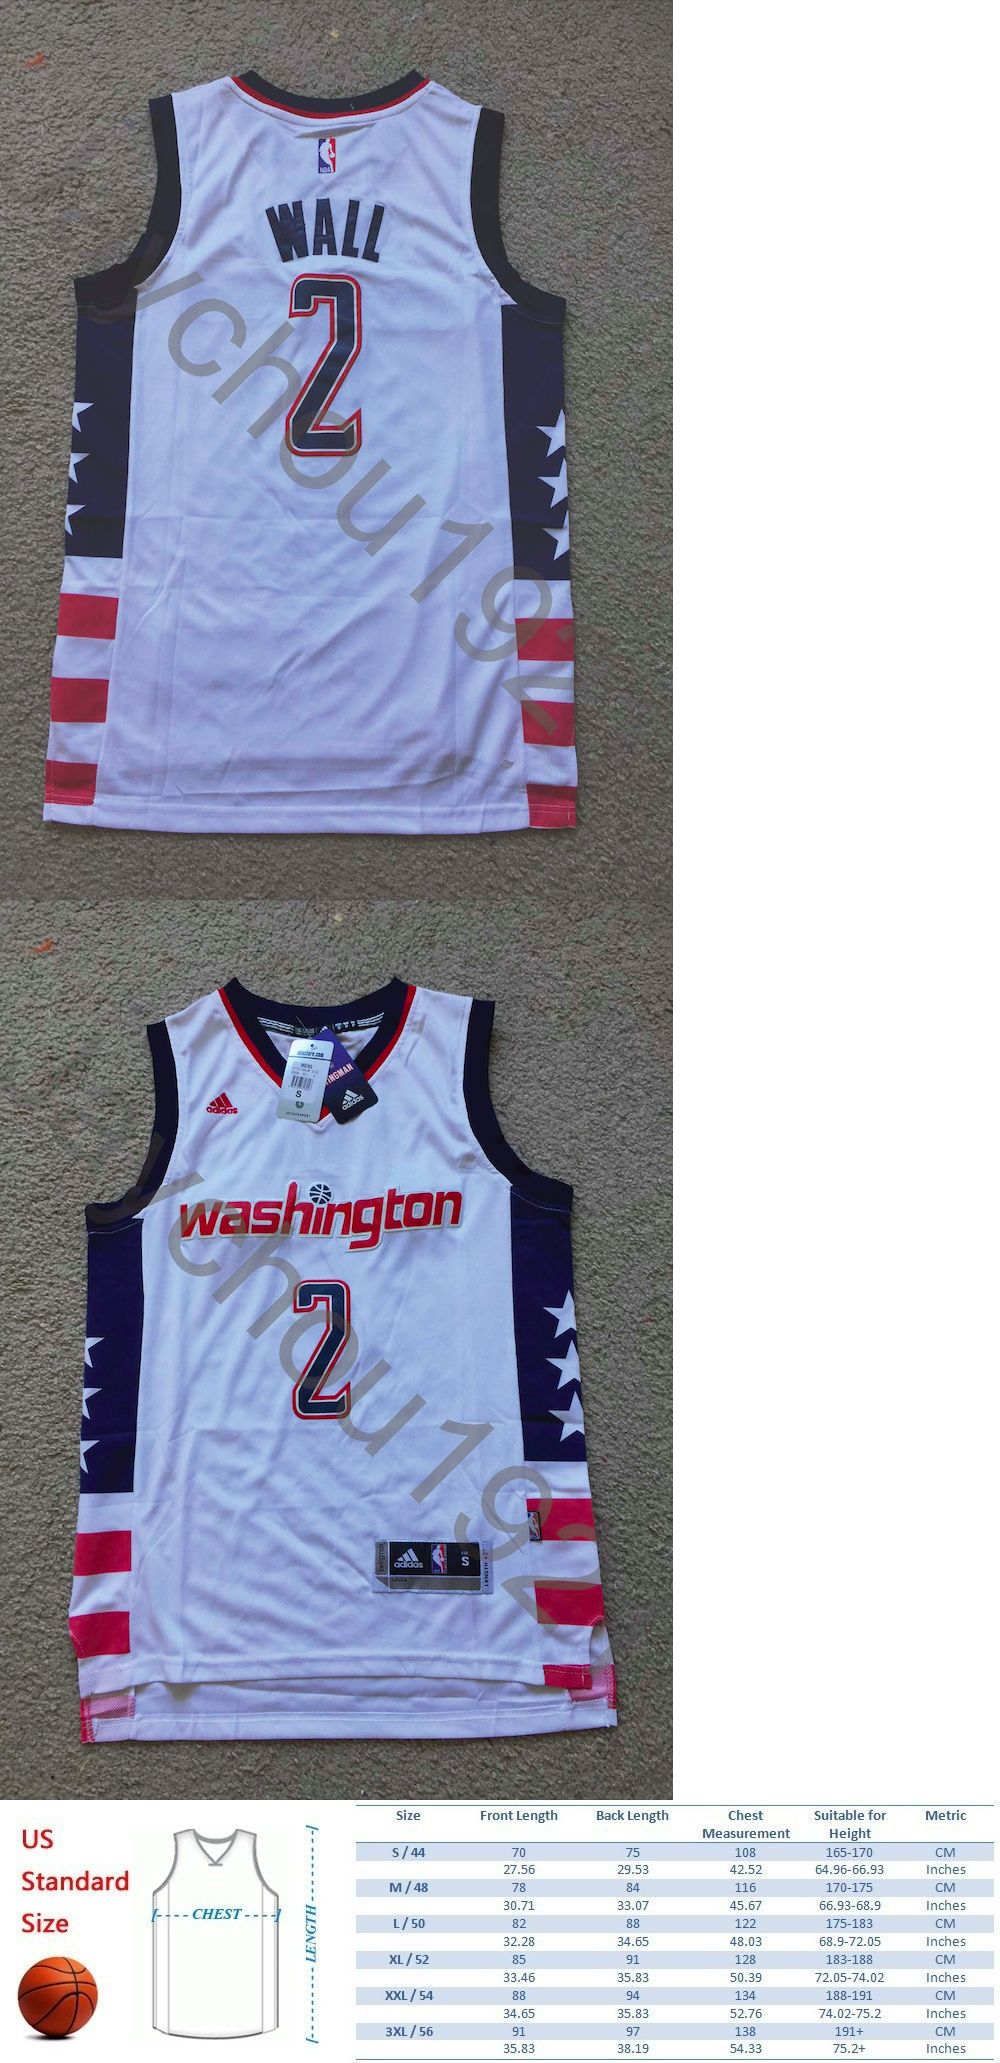 Basketball-NBA 24442: Rare John Wall Washington Wizards White Swingman Sewn  On Jersey Size